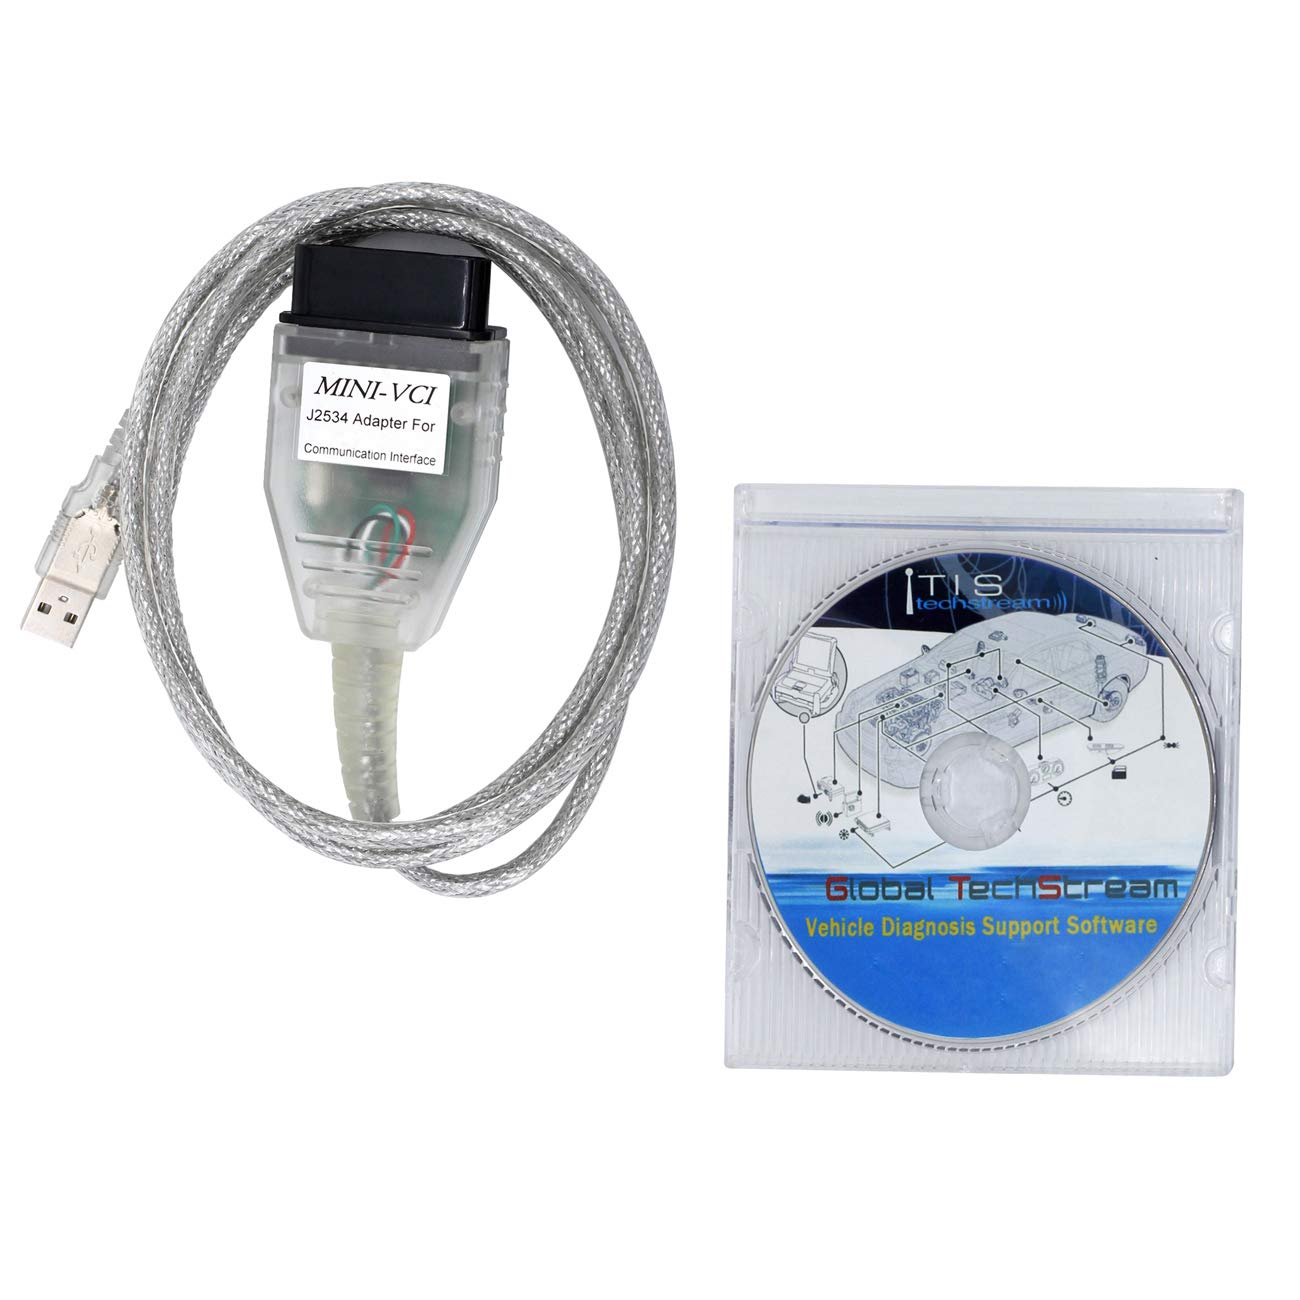 SZ-TONDA Mini VCI Techstream J2534 Cable - V2.0.4 Firmware and V14.10.028 Software TIS Techstream OBD2 K+CAN Code Reader 64bit Scanner Mini-VCI Diagnostic Tool Compatible Lexus Toyota Scion